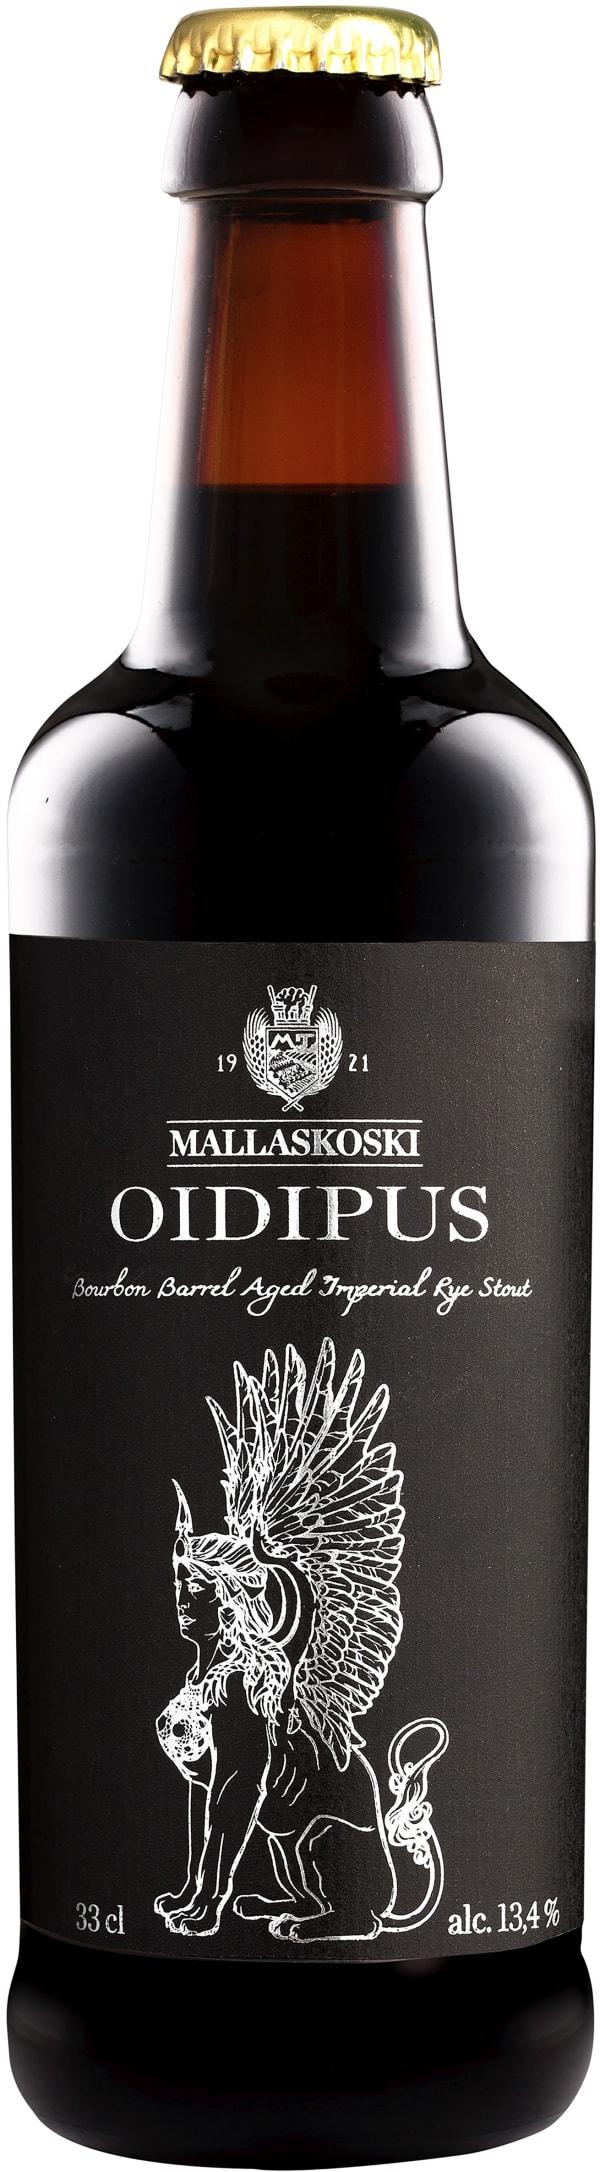 Mallaskoski Oidipus Bourbon Barrel Aged Imperial Rye Stout